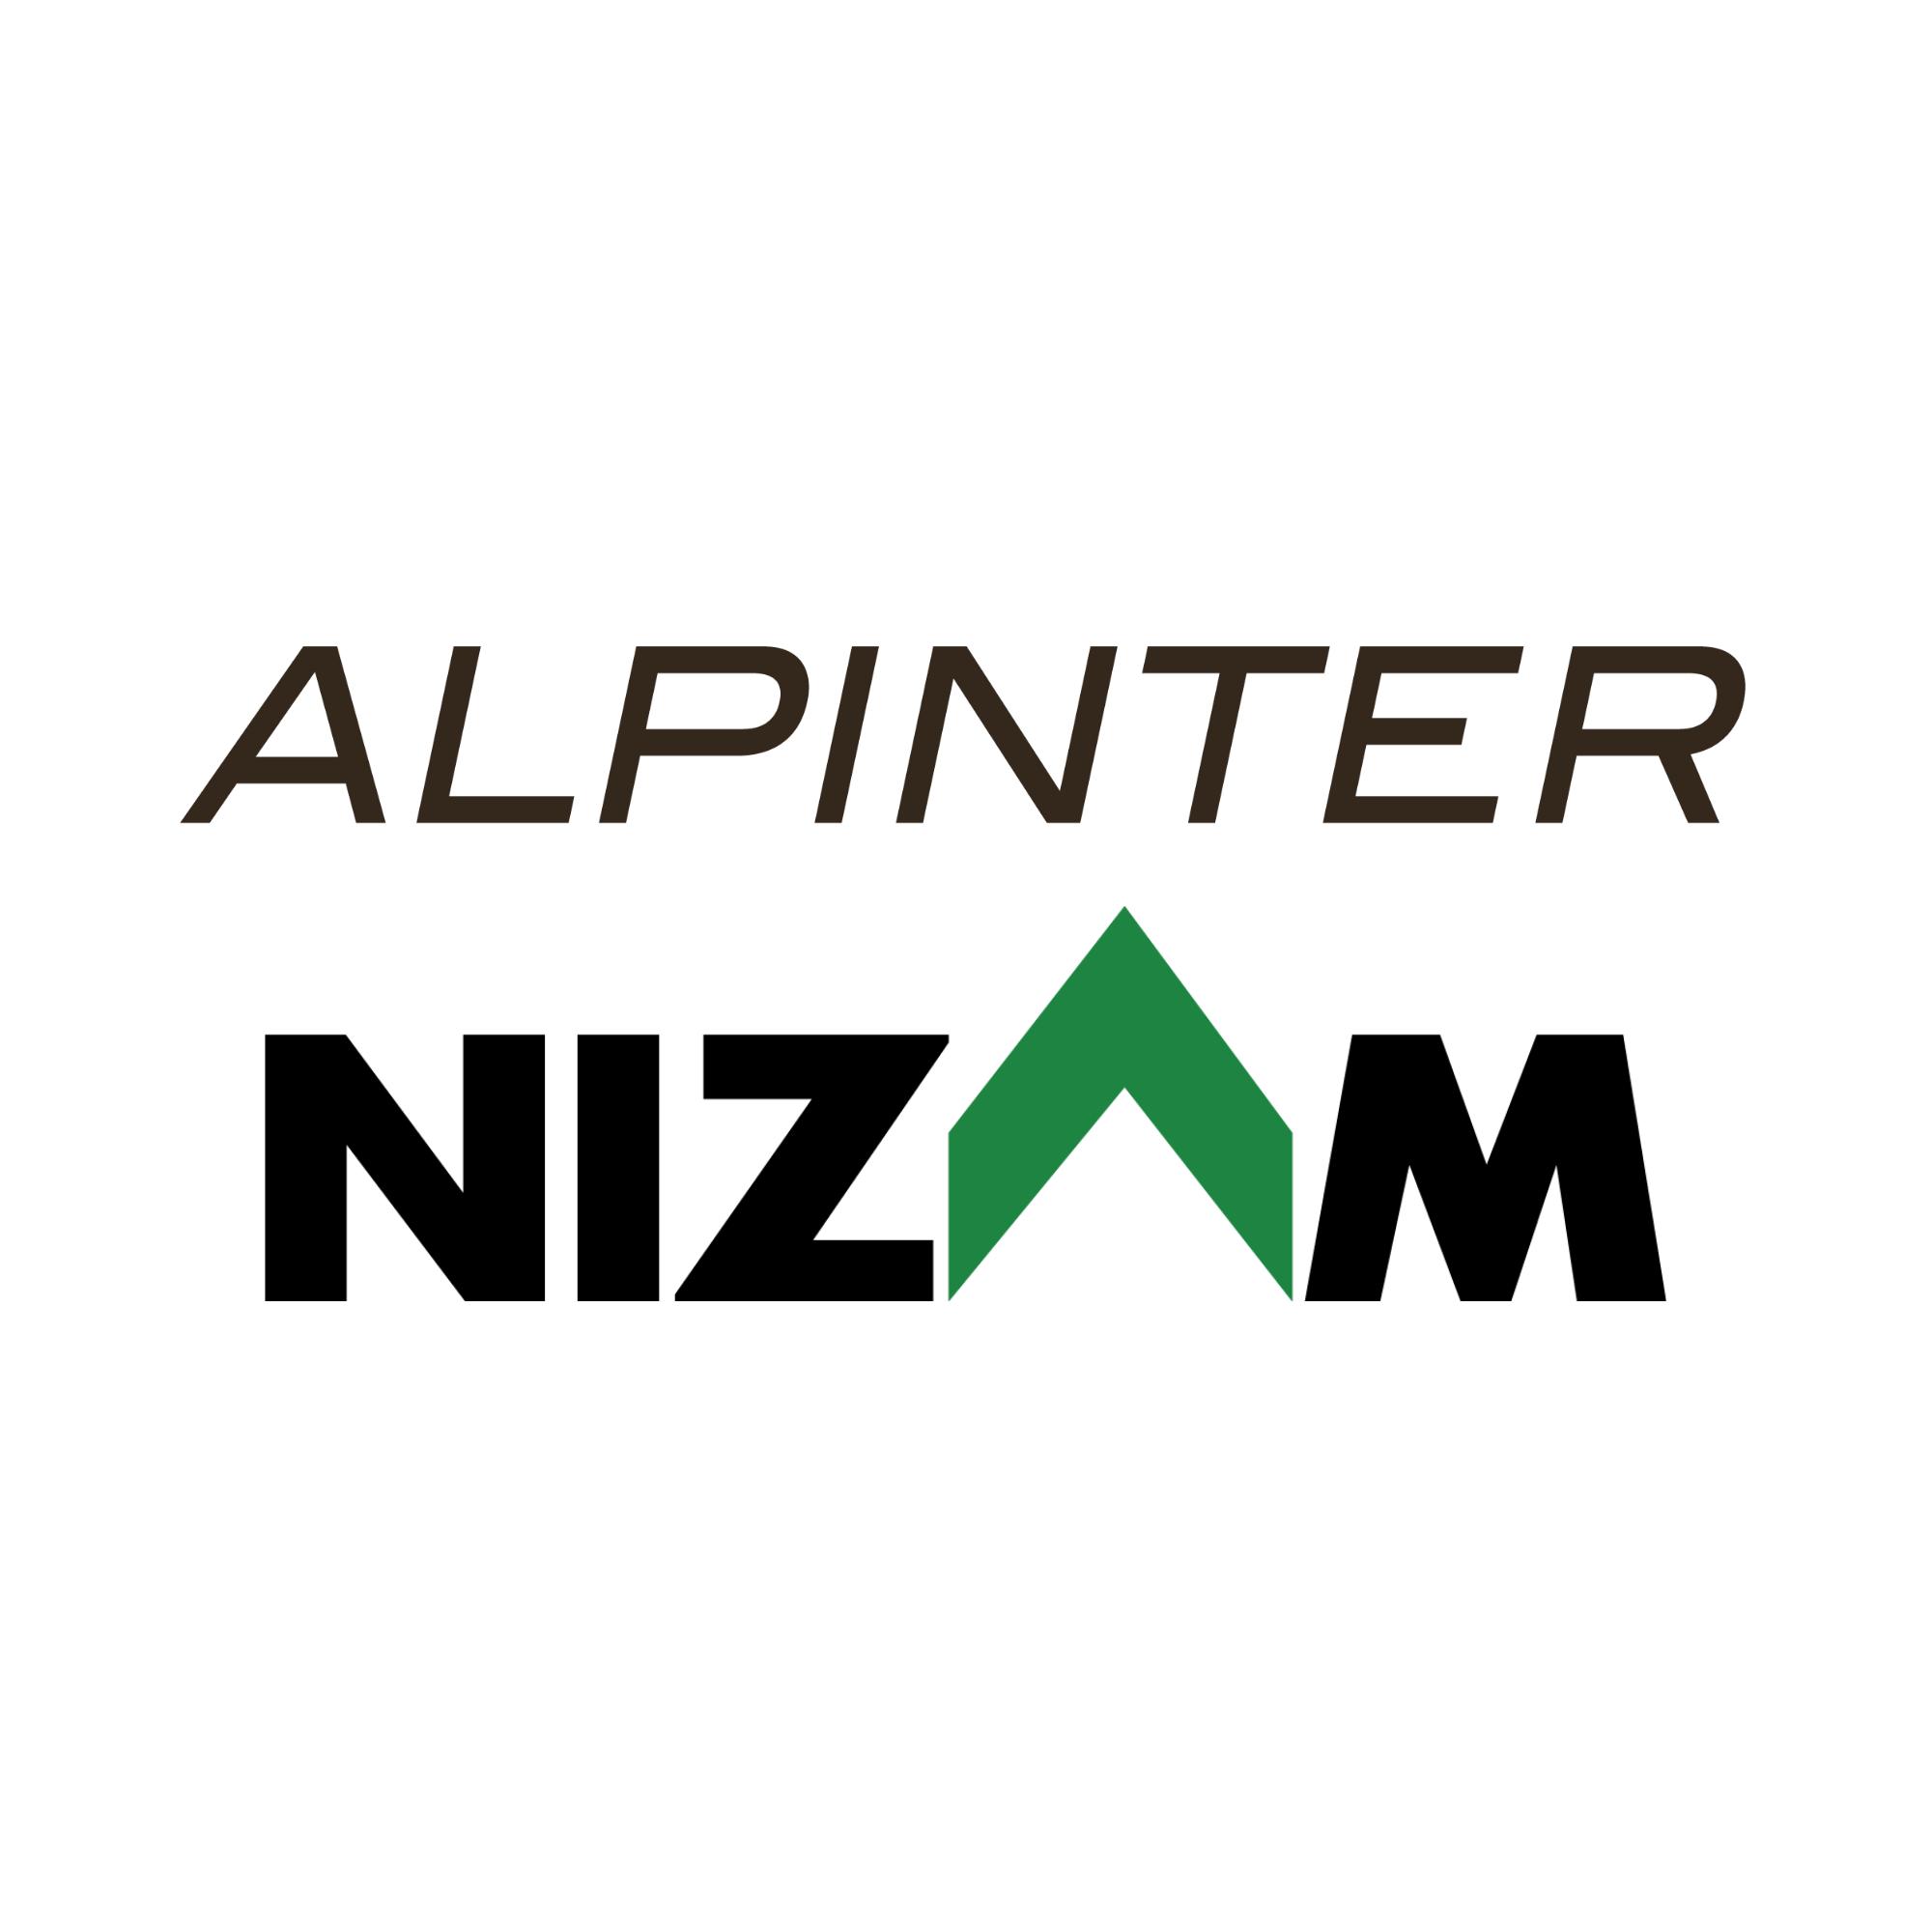 Alpinter